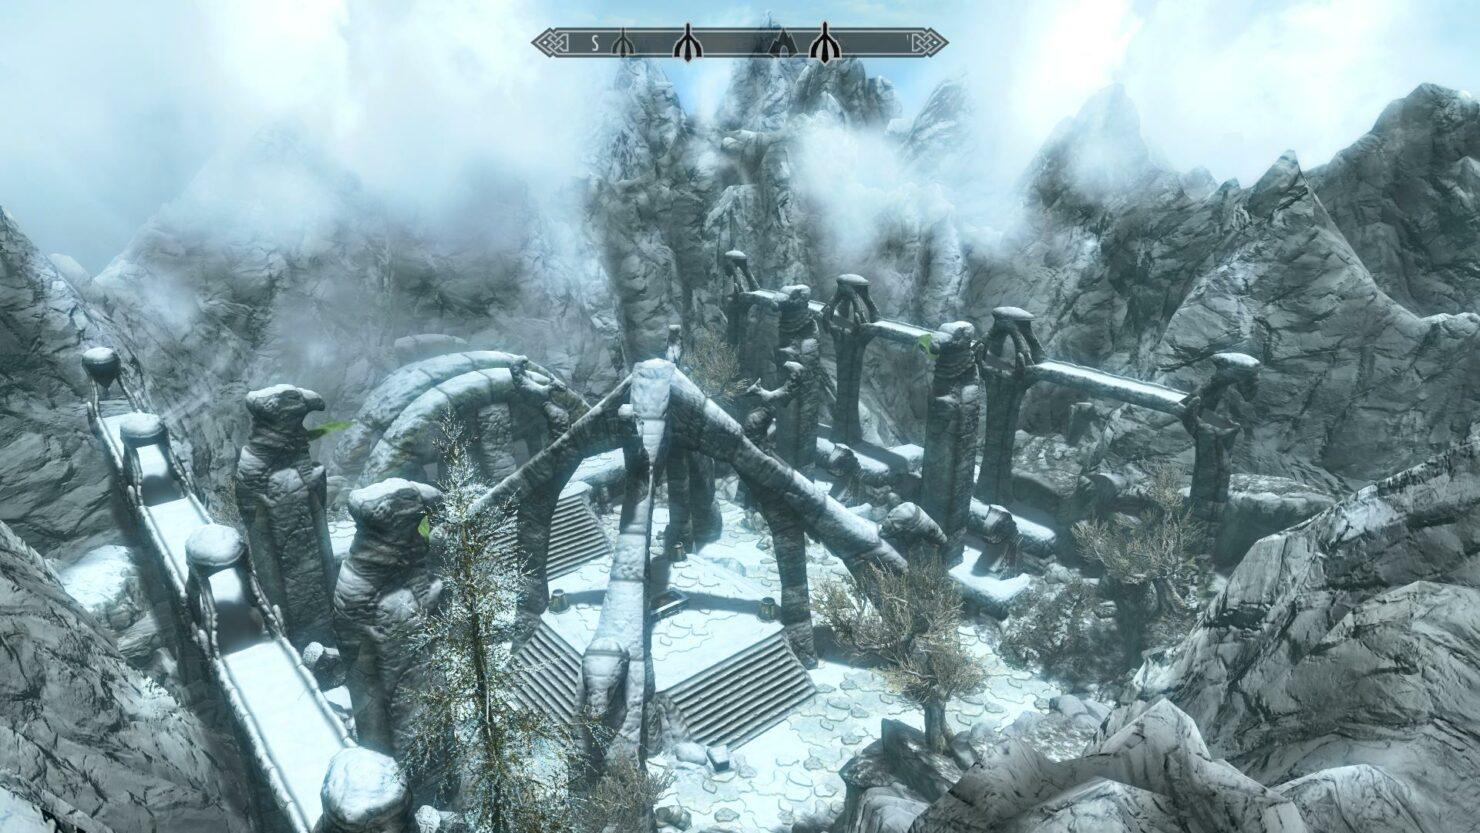 Witcher 3-Inspired Skyrim Fan Expansion Land of Vominheim